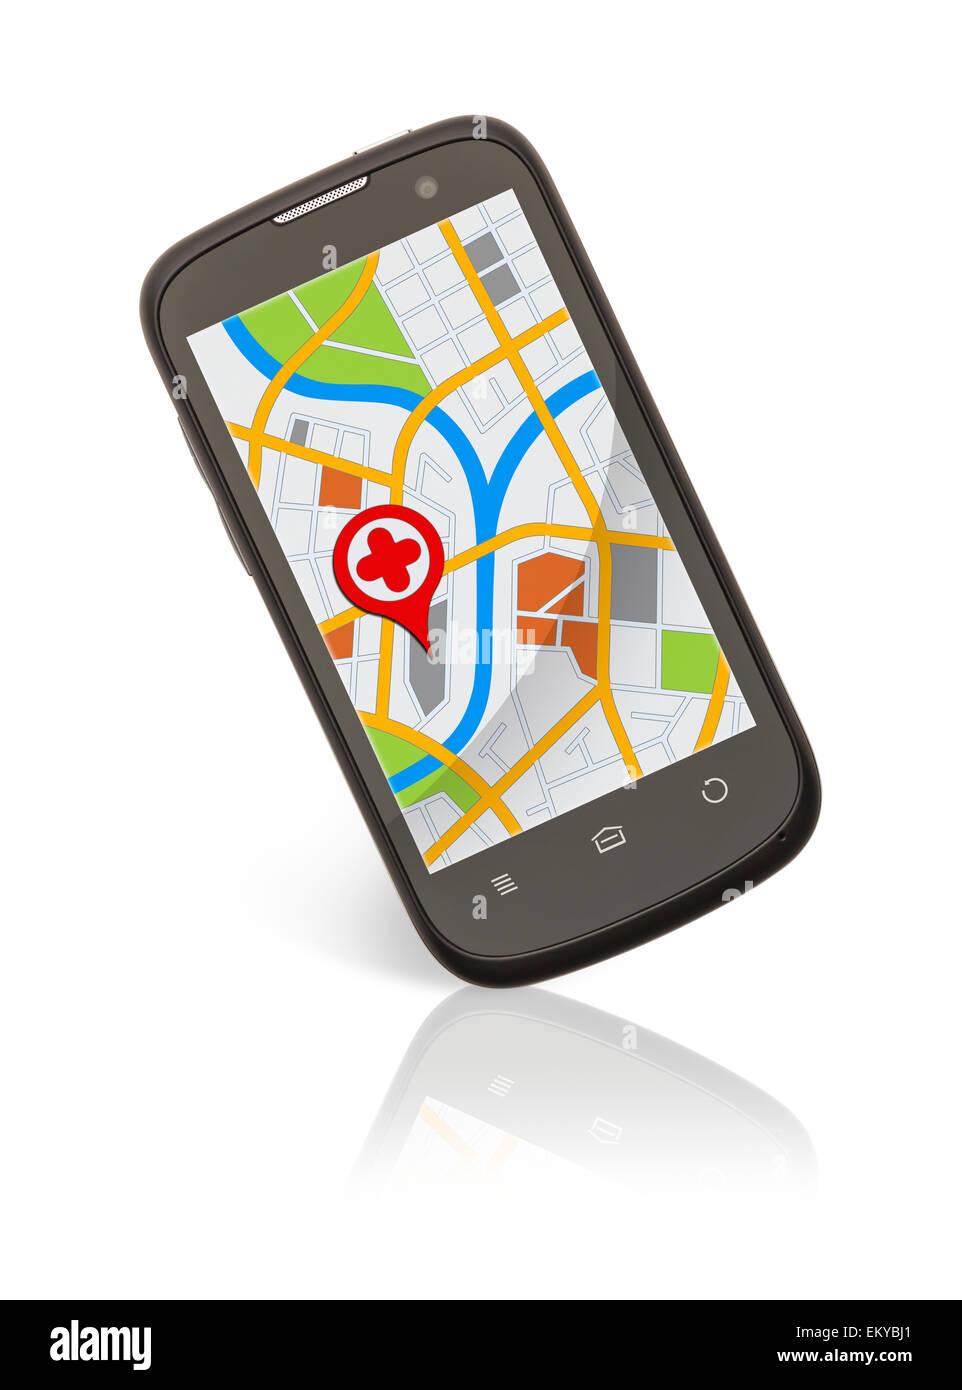 Teléfono inteligente con mapa de ubicación aislado sobre fondo blanco. Foto de stock